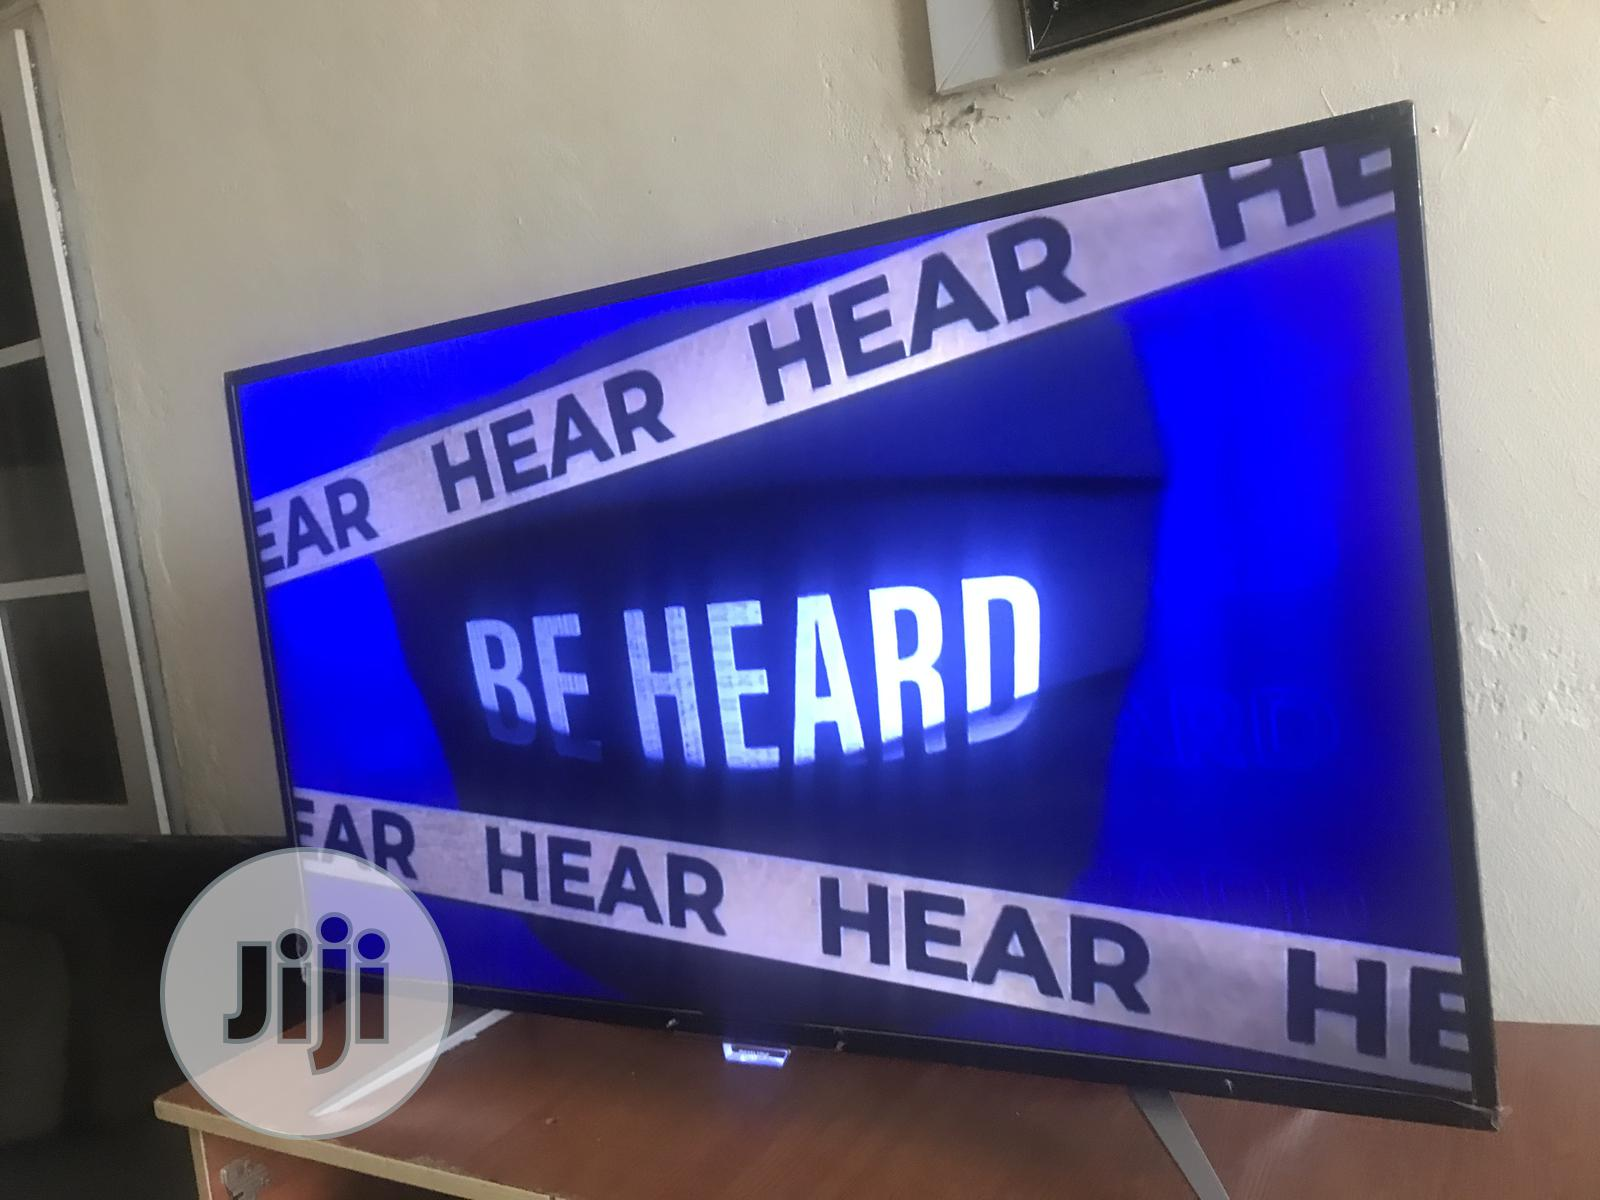 Philips 43 Inch 4K UHD Smart TV